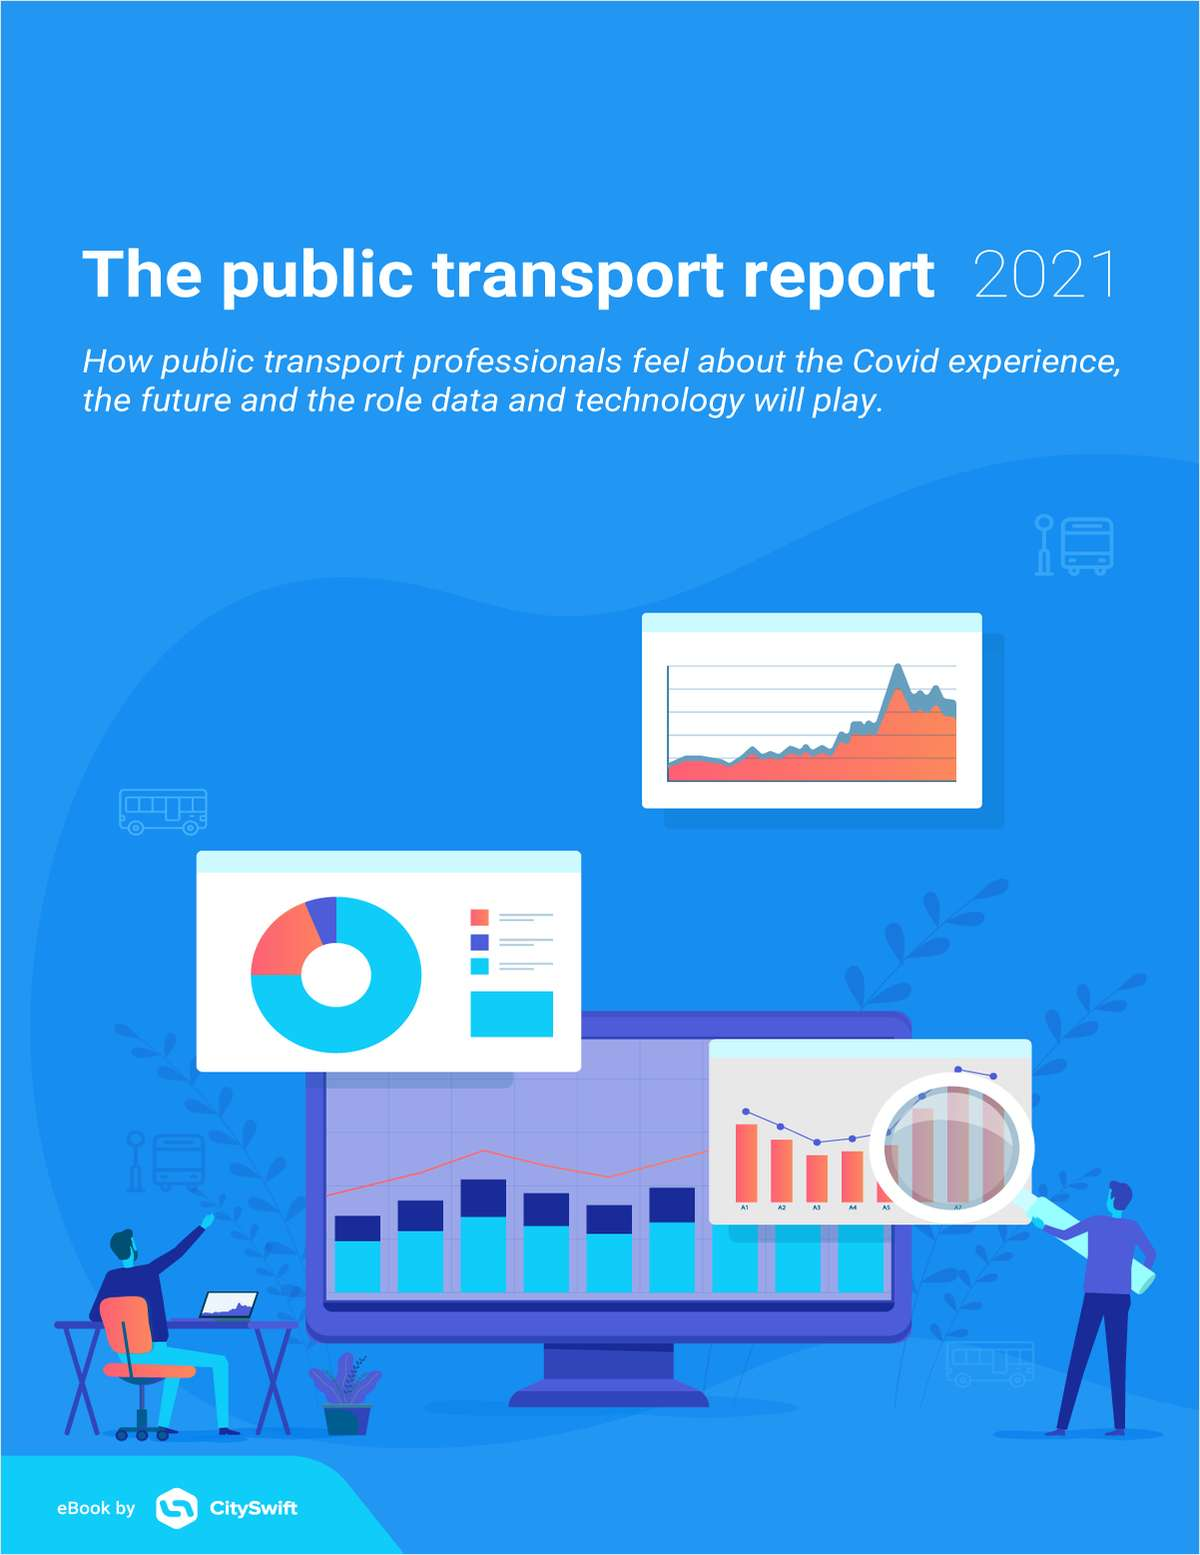 The Public Transport Report 2021